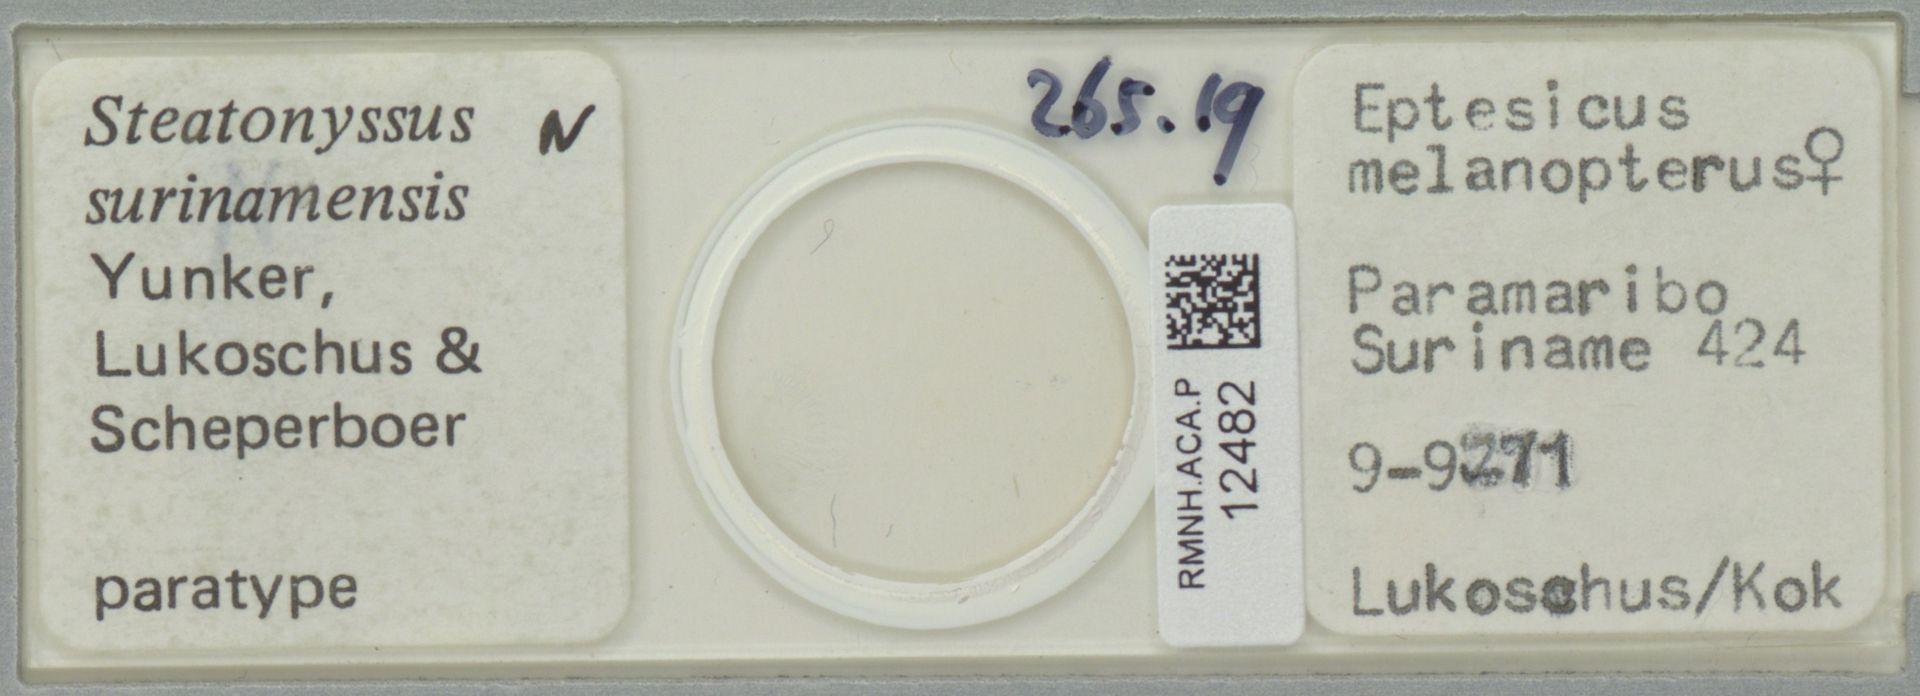 RMNH.ACA.P.12482 | Steatonyssus surinamensis